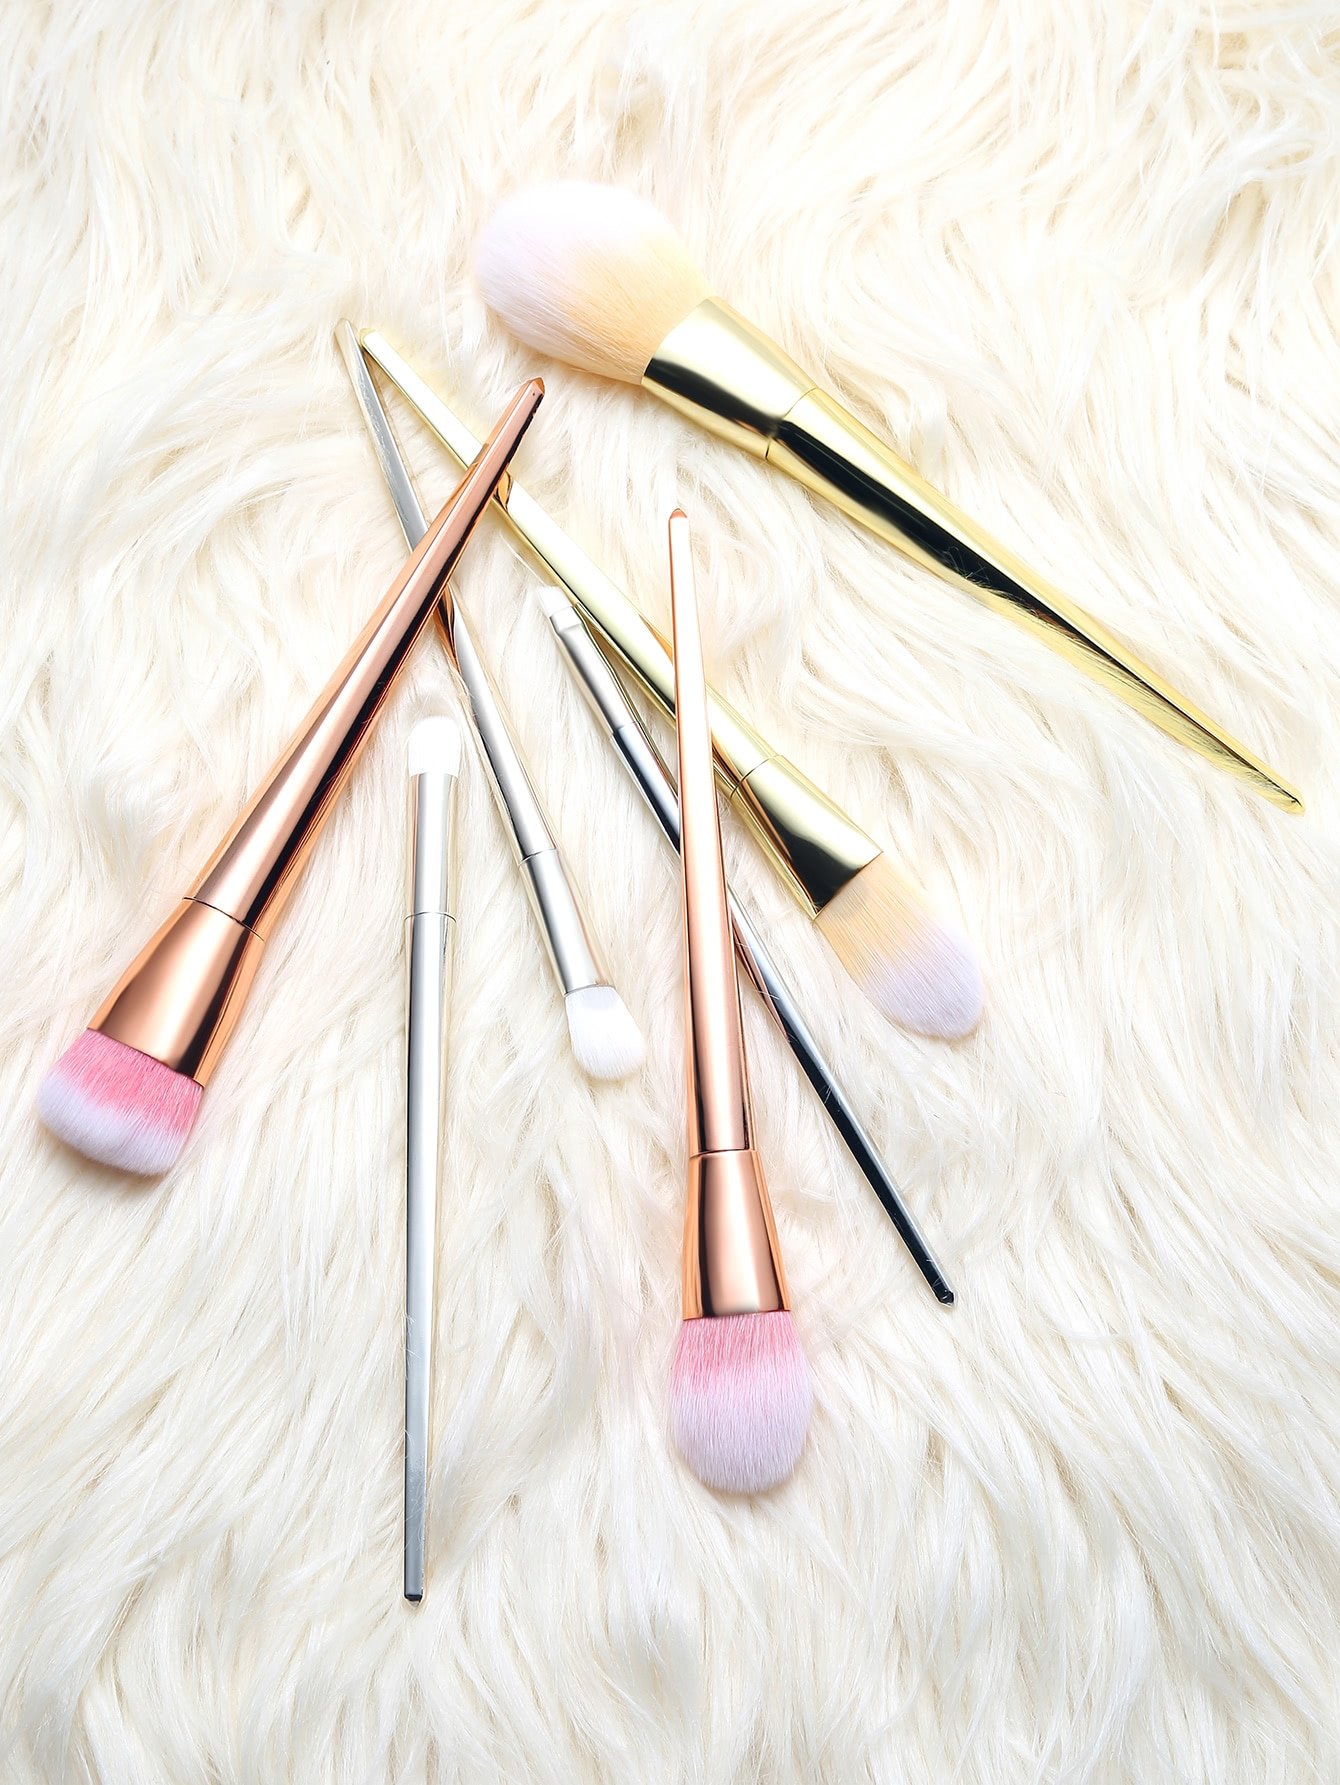 Multicolor Professional Makeup Brush Set 7PcsMulticolor Professional Makeup Brush Set 7Pcs<br><br>color: Multicolor<br>size: None